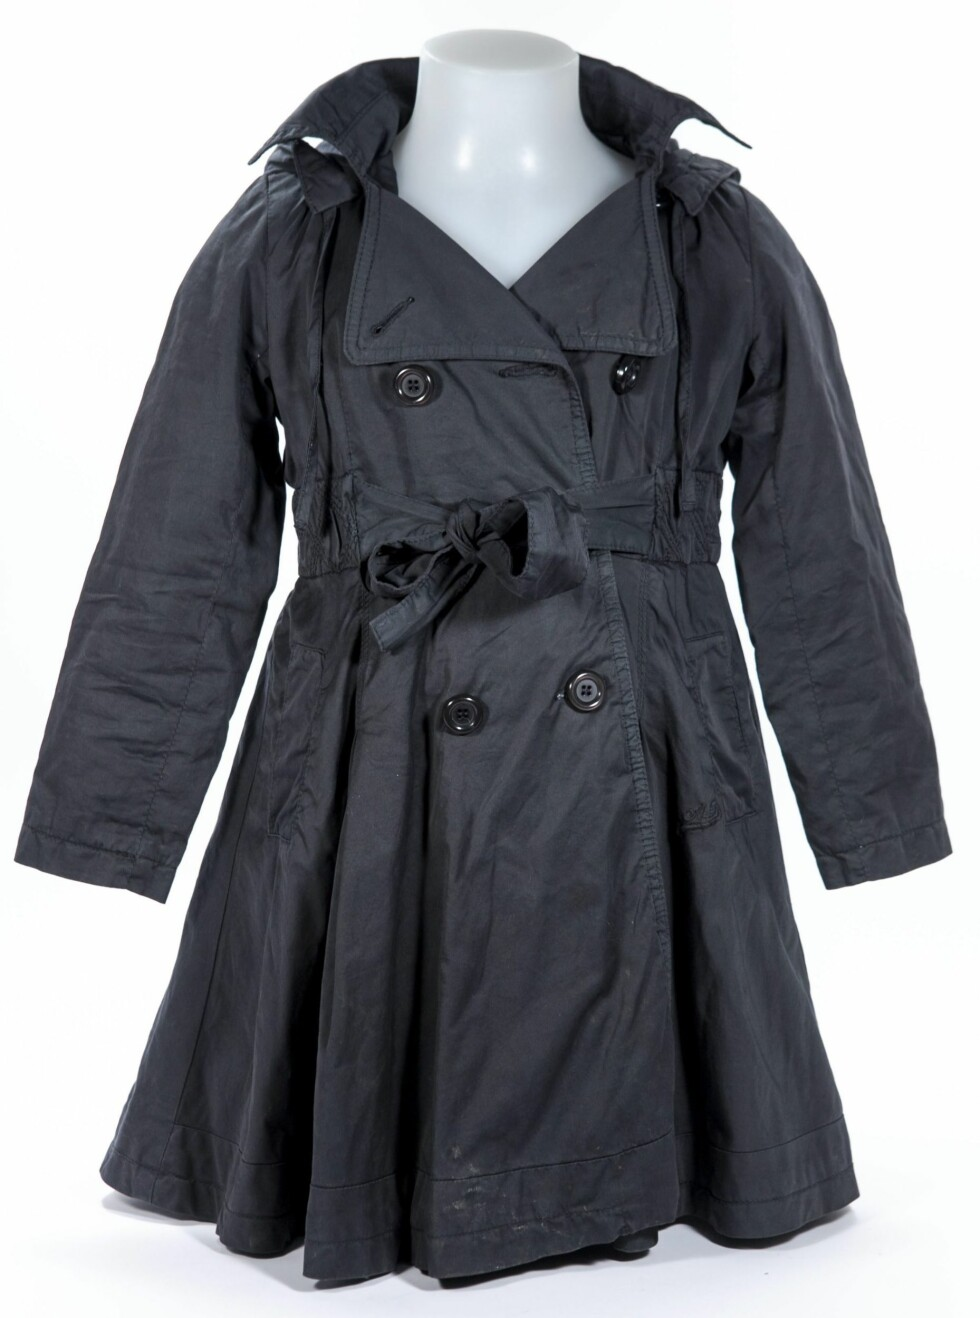 En sort kåpe/trenchcoat fra American outfitters, størrelse 6 år.